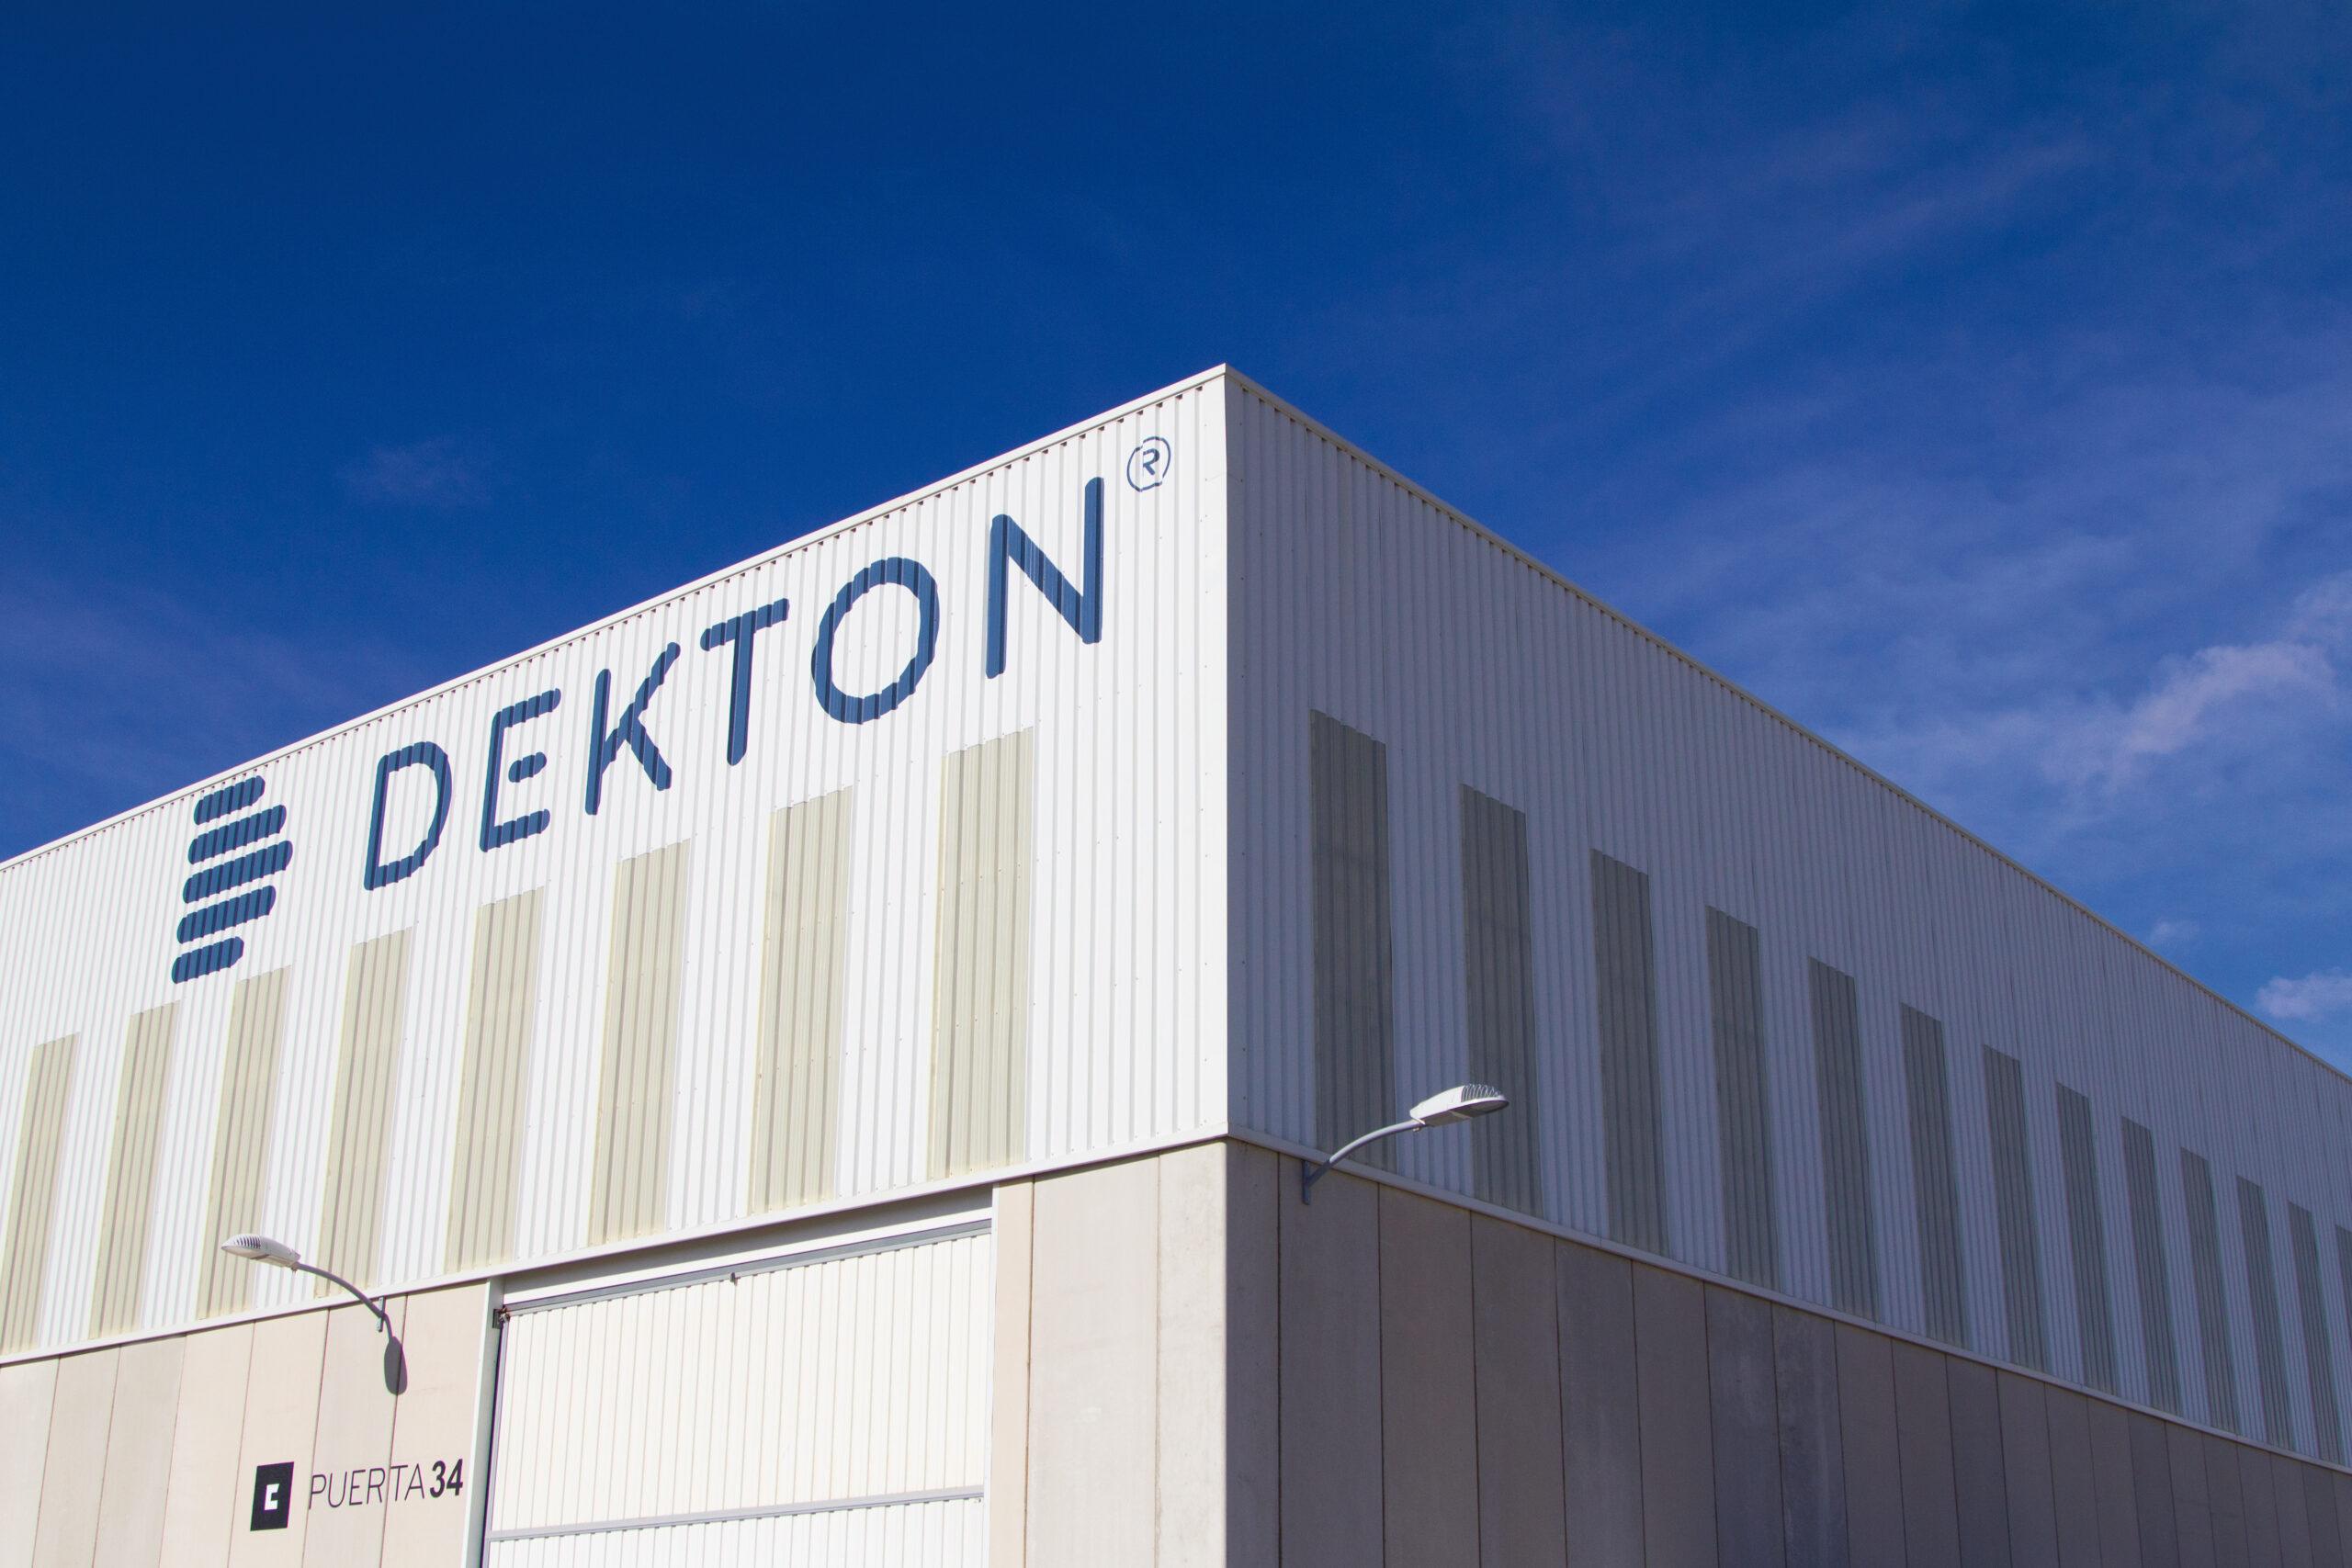 Image of dekton fabrica exterior 2 scaled in Dekton by Cosentino receives International Environmental Product Declaration - Cosentino